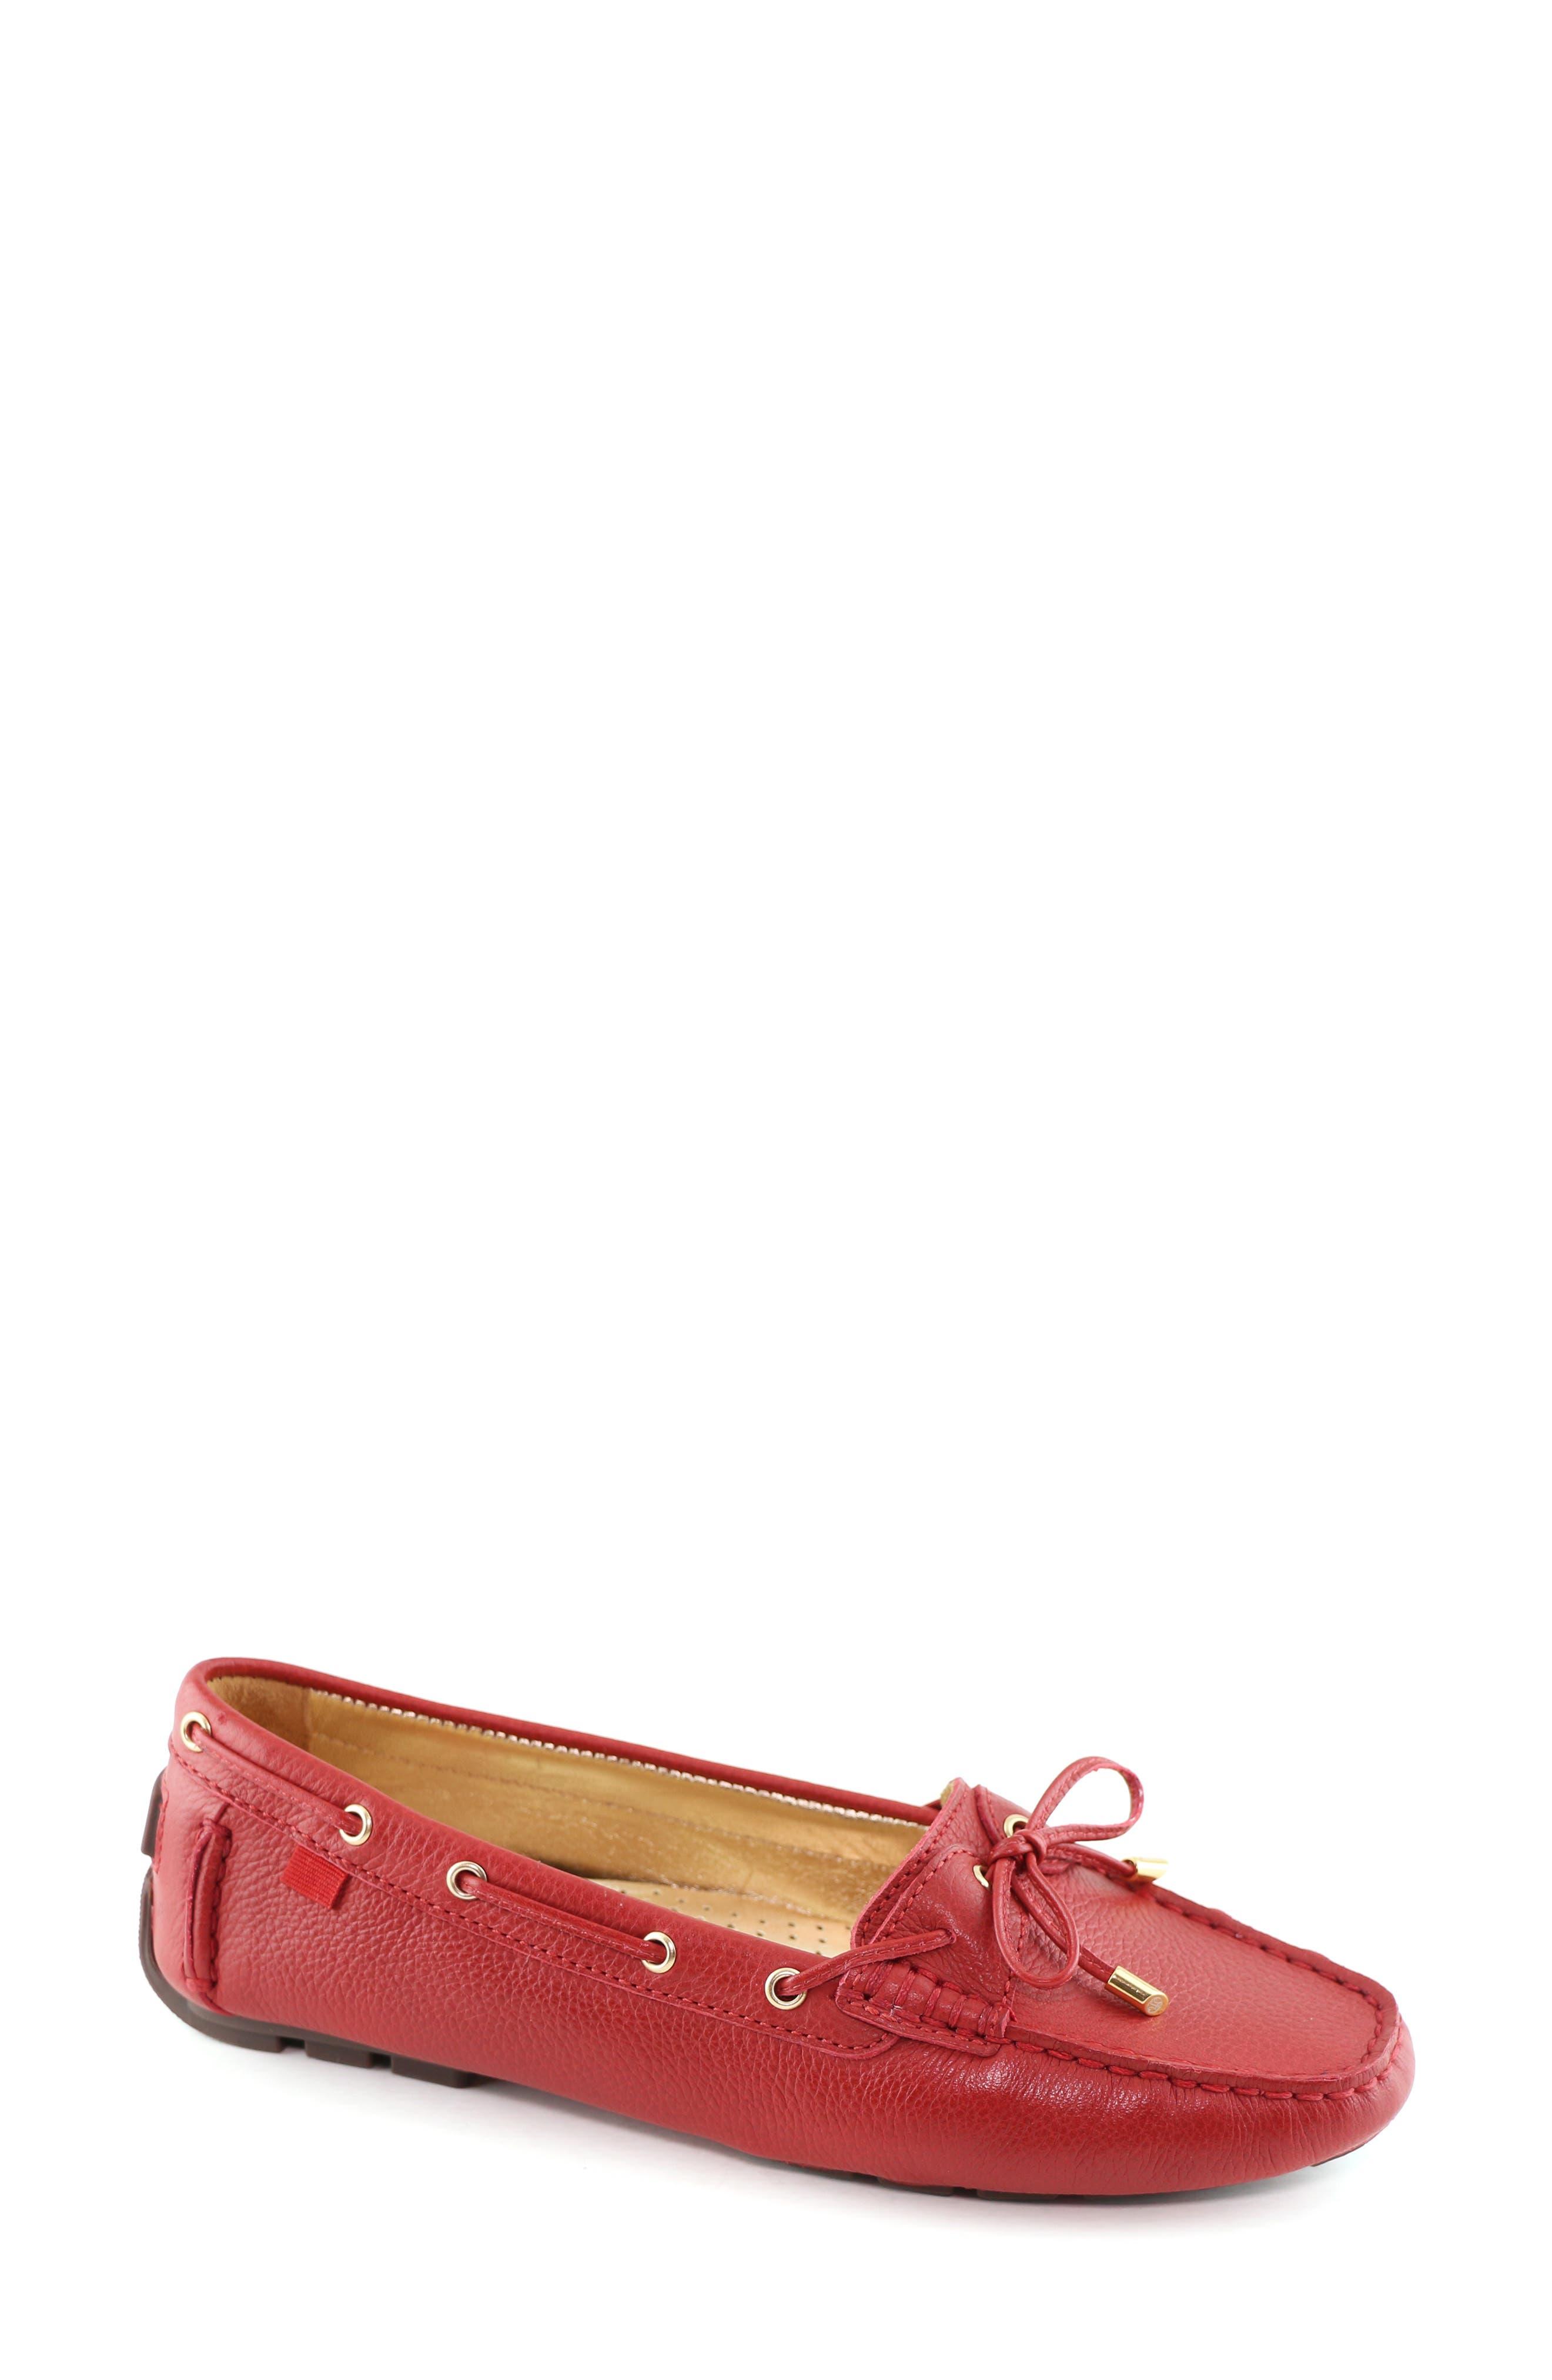 Marc Joseph New York Rockaway Loafer- Red